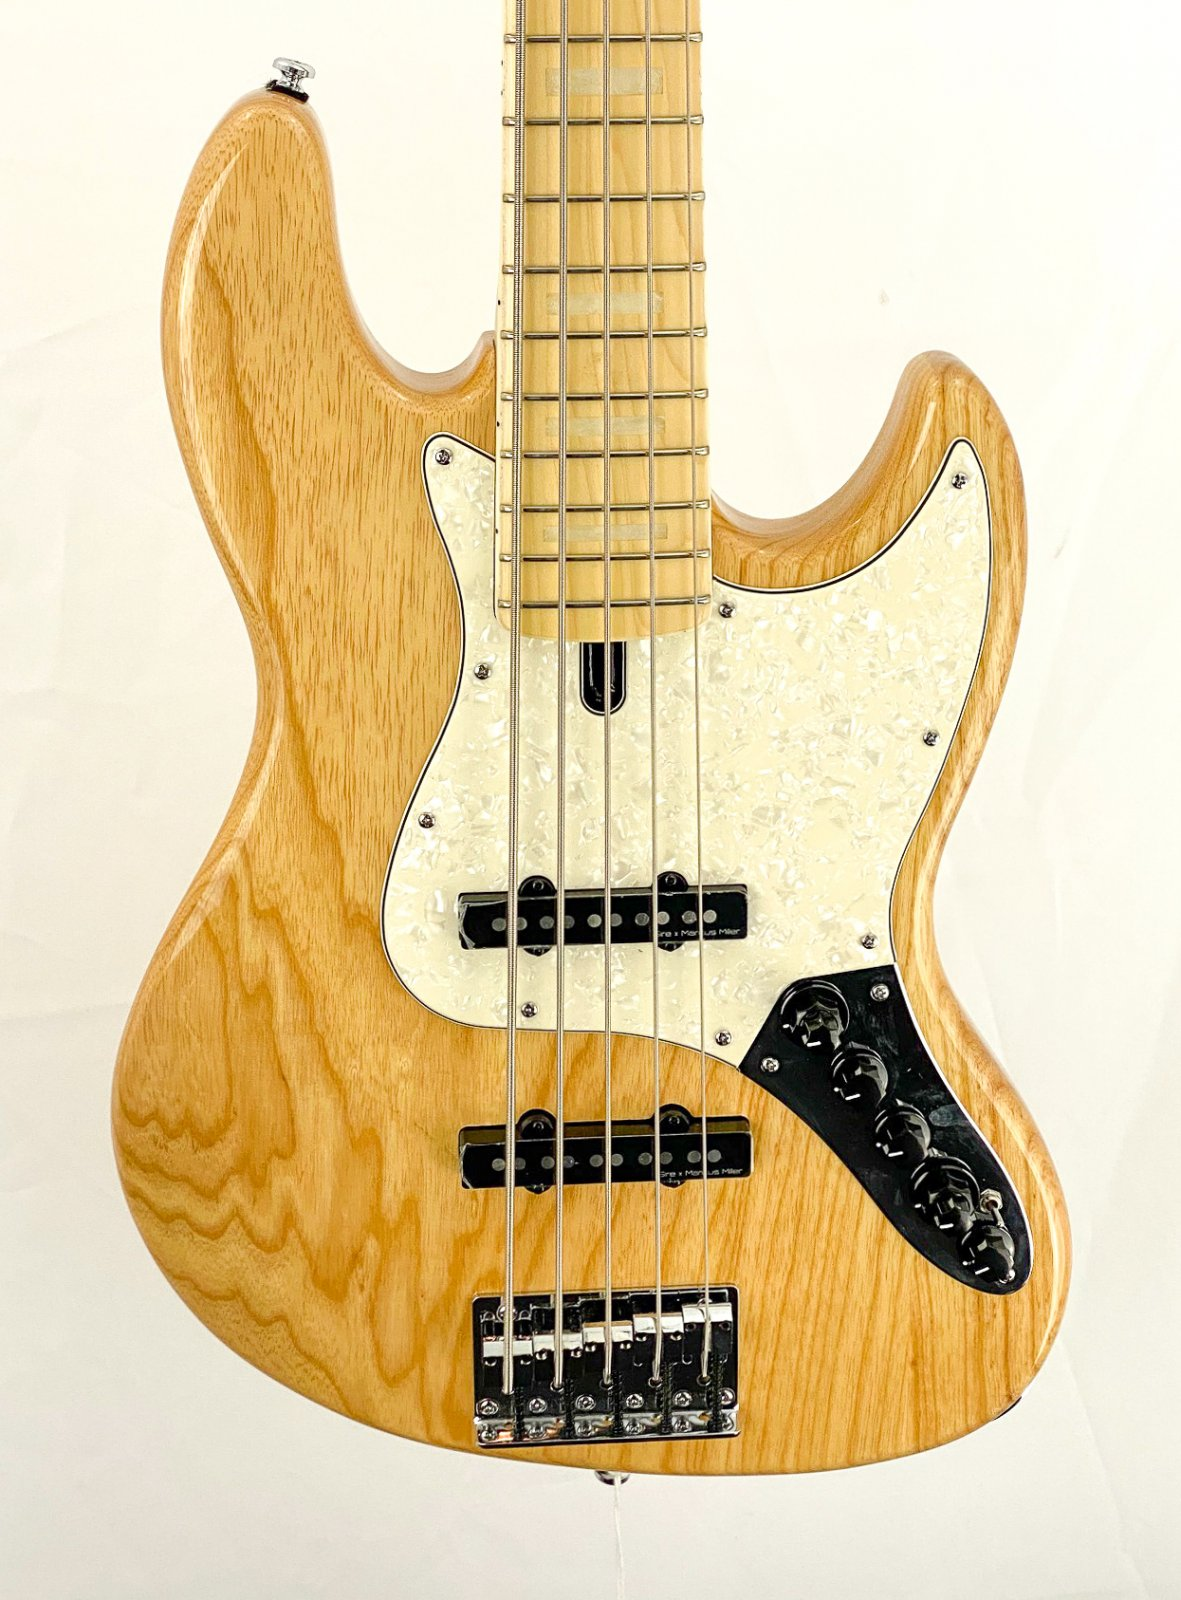 Marcus Miller V7 5-string bass - ash